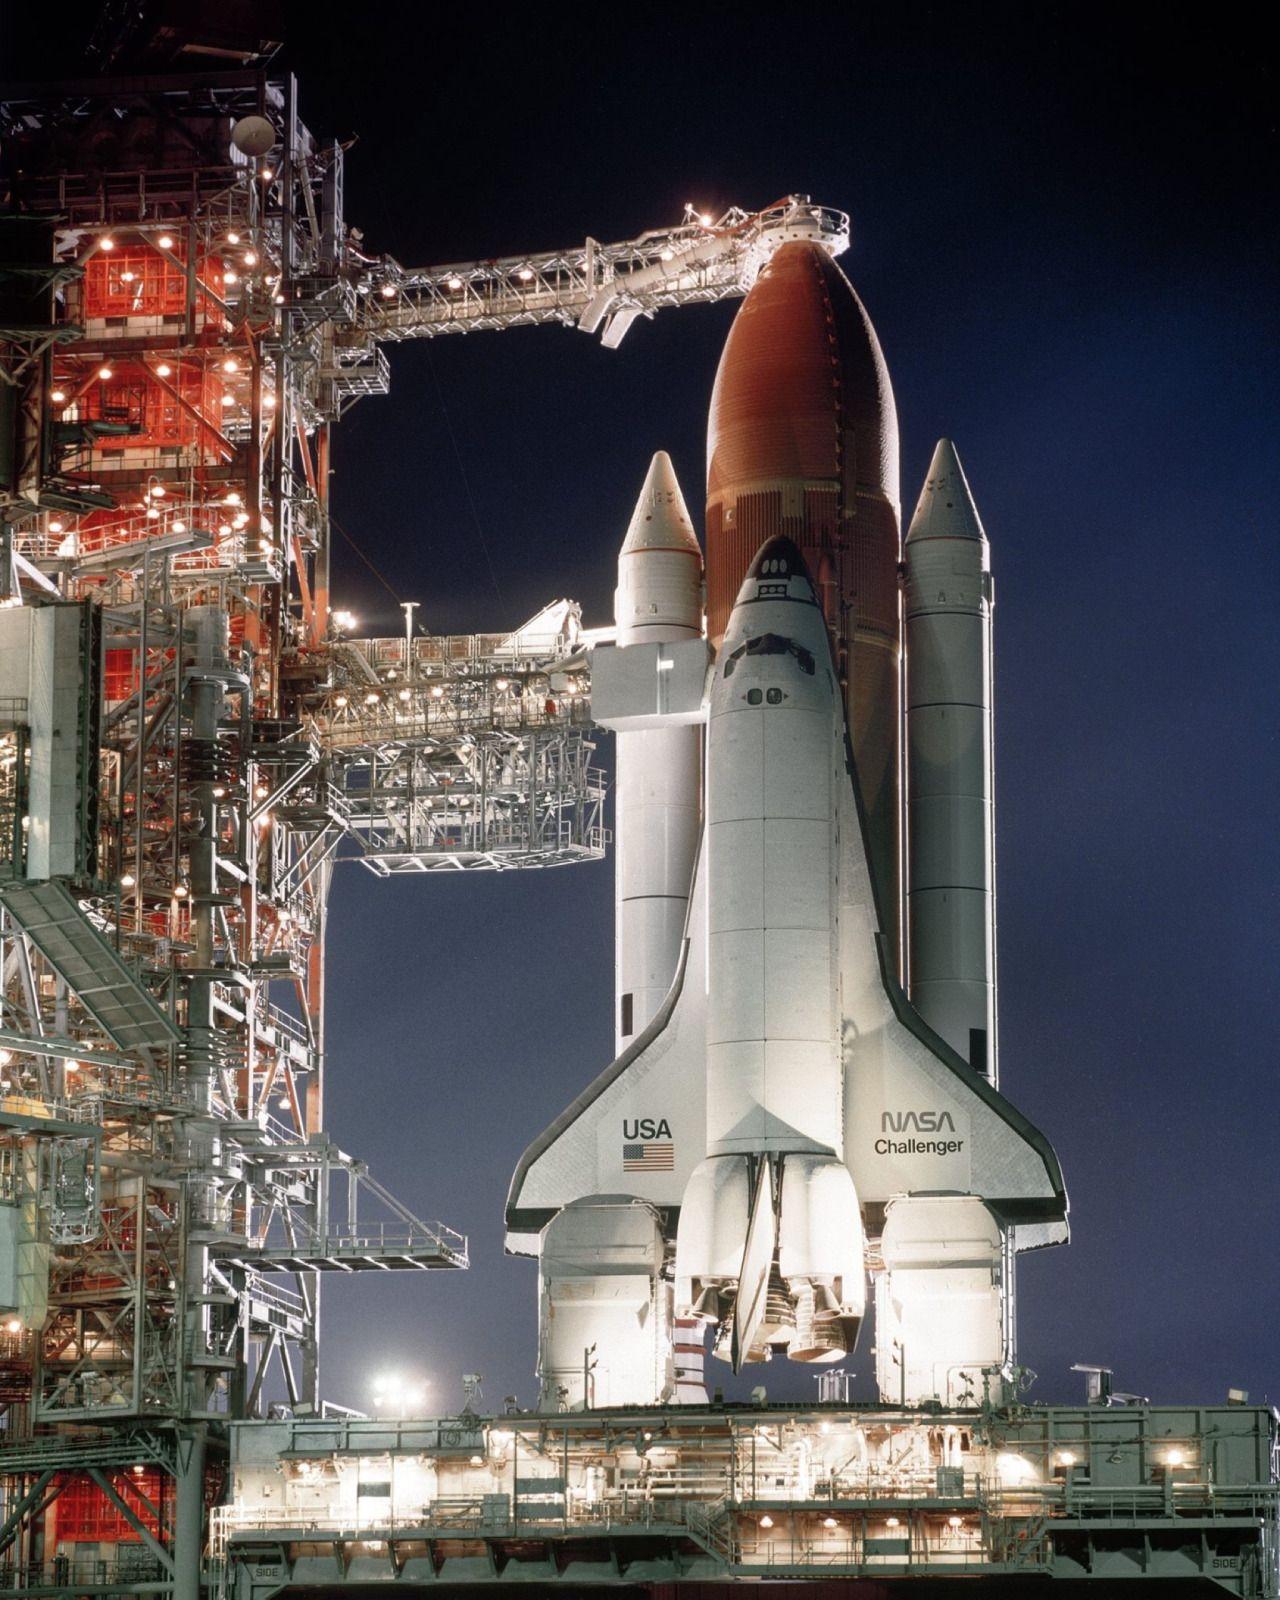 nasa new space shuttle program - photo #23